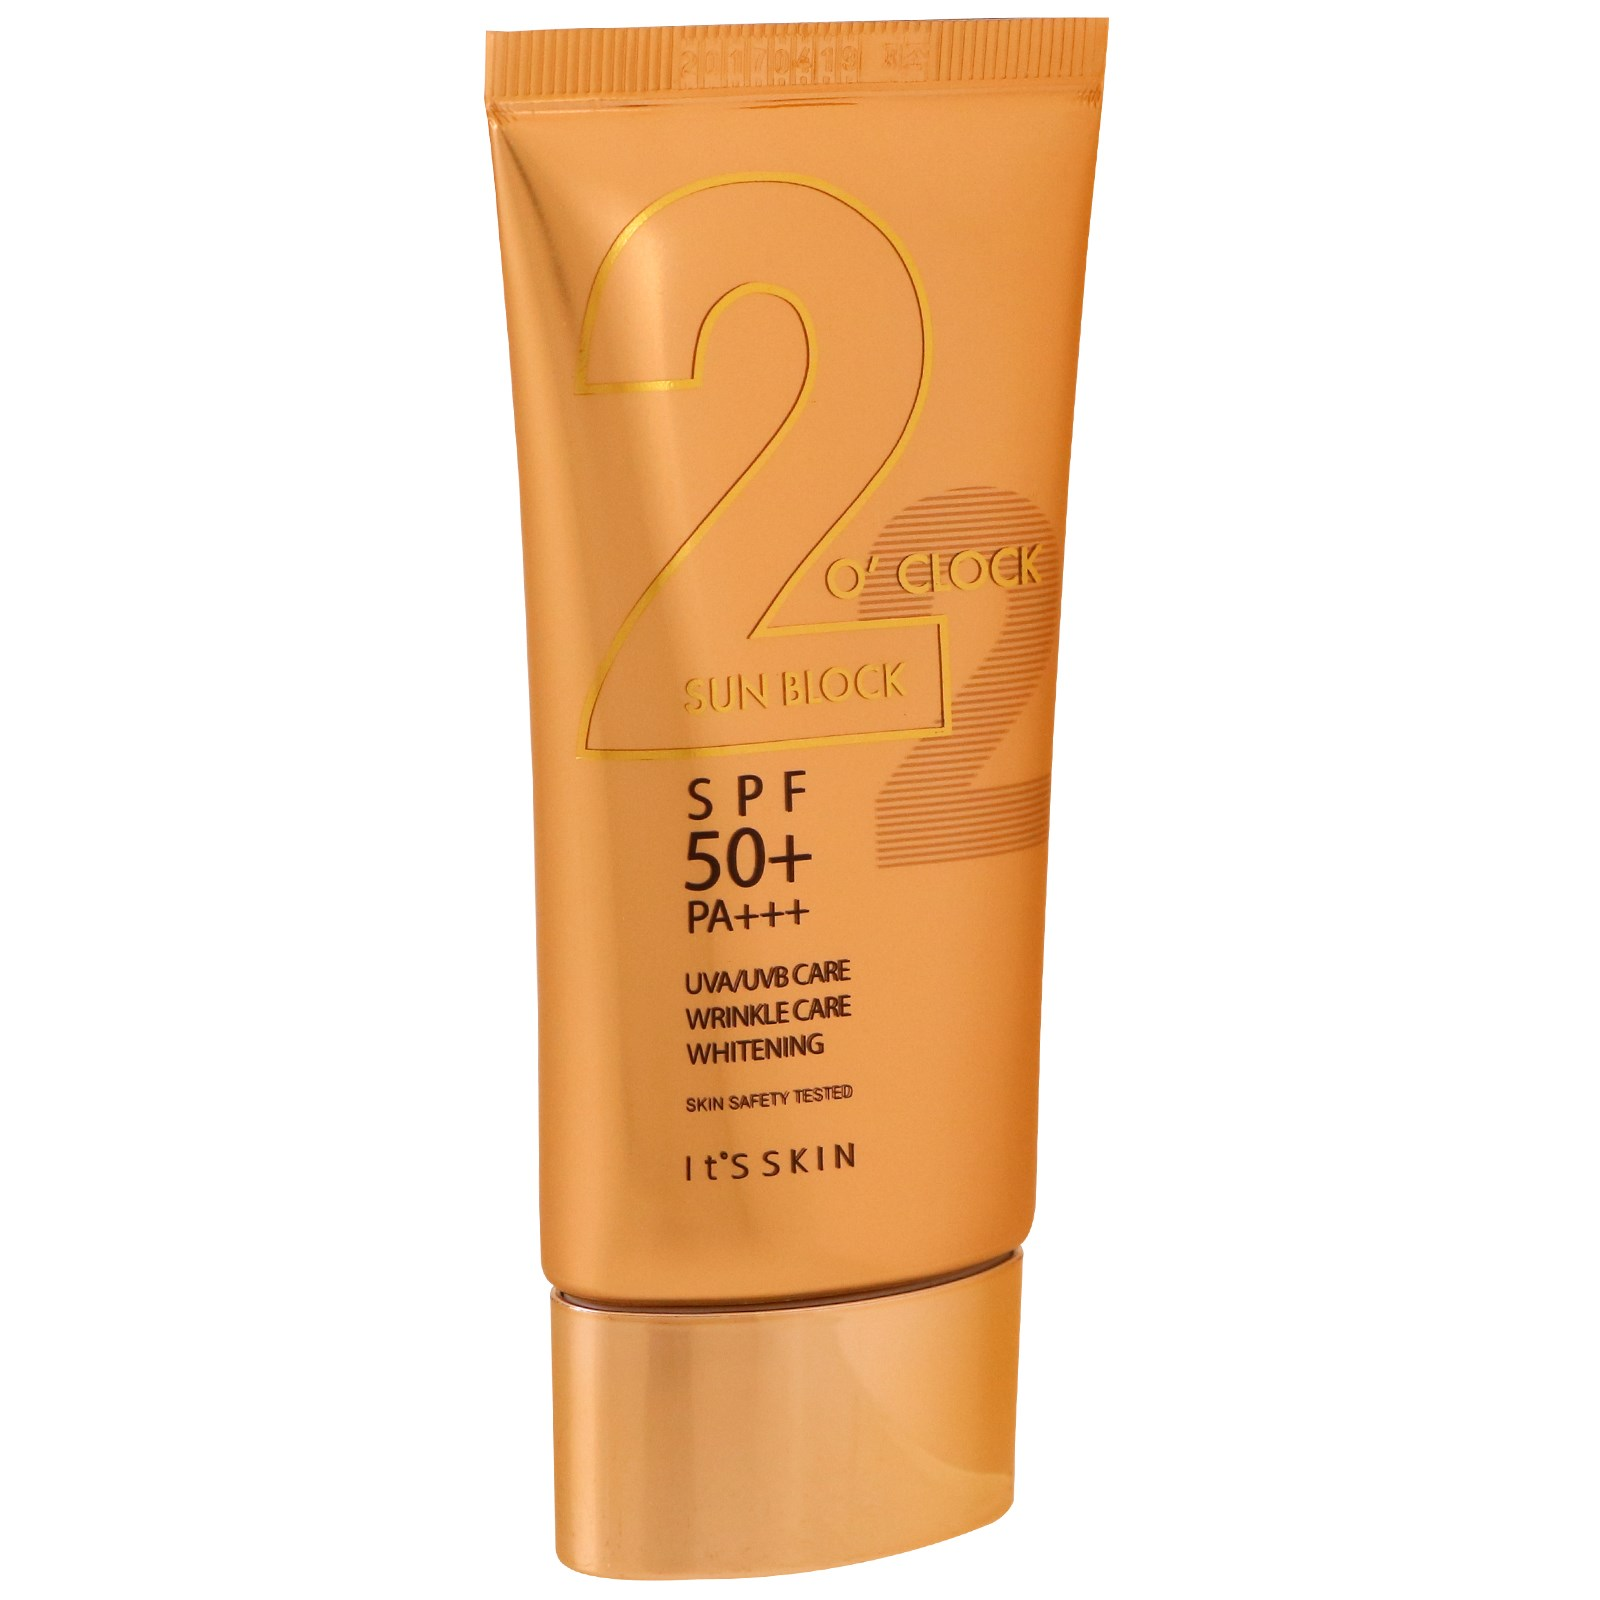 It's Skin, 2 PM, Sunblock, SPF 50+, 50 ml